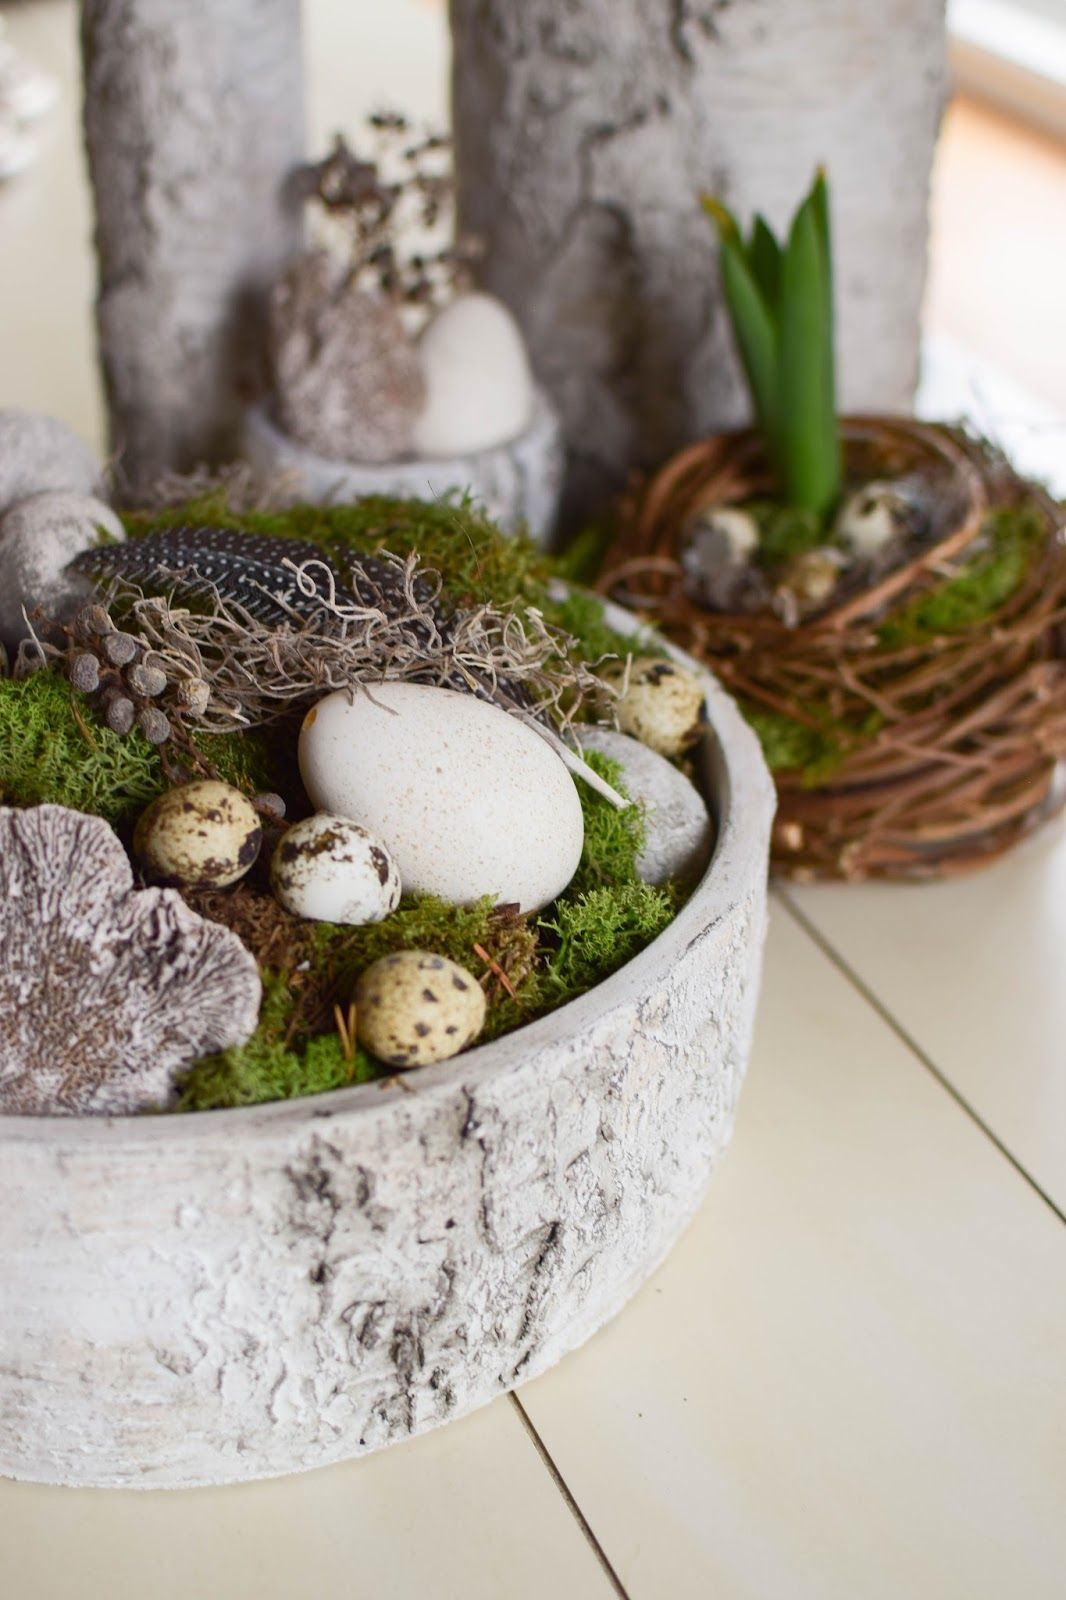 Diy Fruhlingsschale Fur Euren Tisch Deko Mit Naturmaterialien